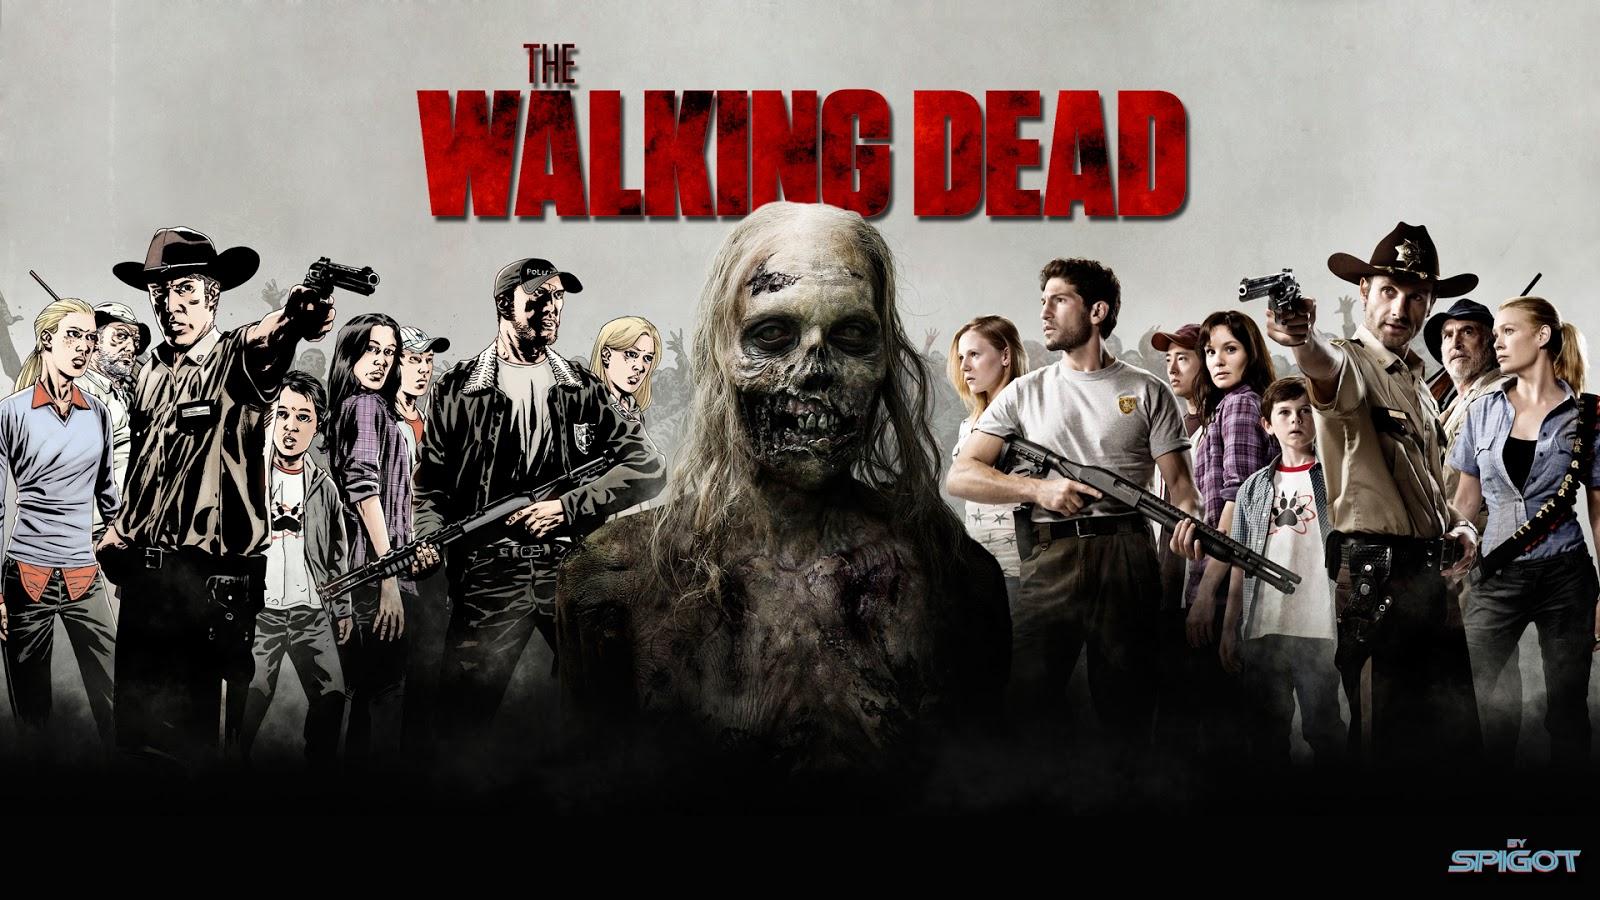 http://4.bp.blogspot.com/-dtdwBy1ca7w/UbFWzZoYm6I/AAAAAAAAAB4/SPZGd6vu5a4/s1600/The-Walking-Dead-Season-3-Wallpaper-HD.jpg